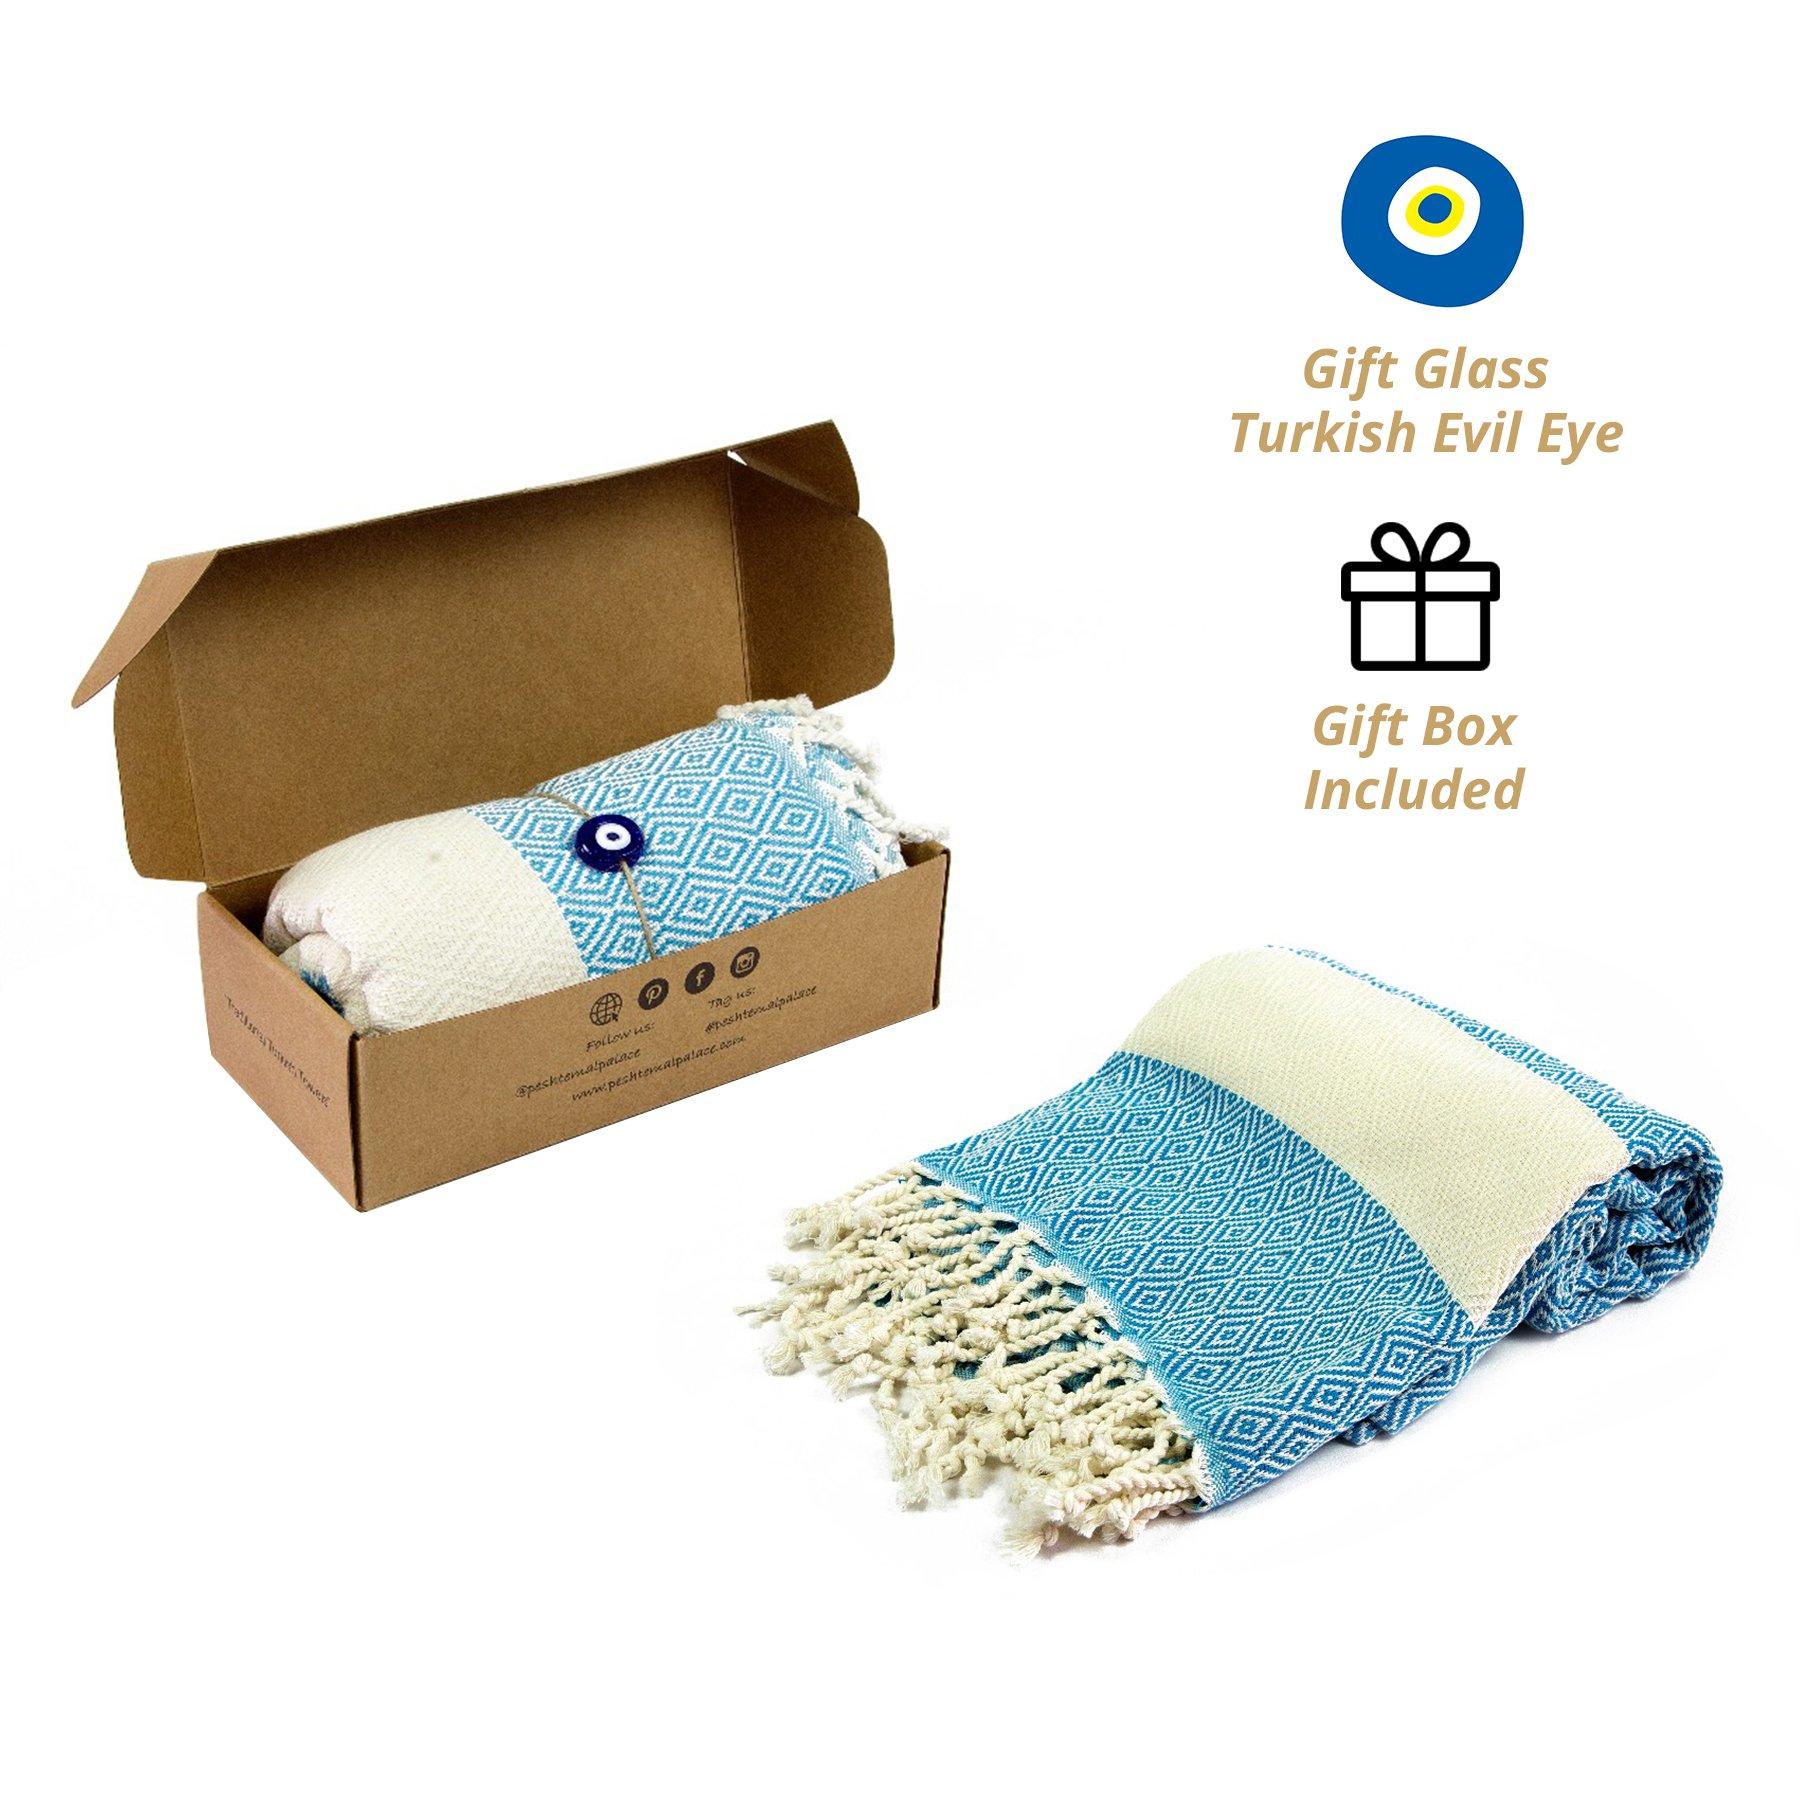 Peshtemal Palace %100 Turkish Cotton Diamond Pestemal Towel; Beach Towel, Natural Gift (71 inches x 39 inches)(Turquoise)